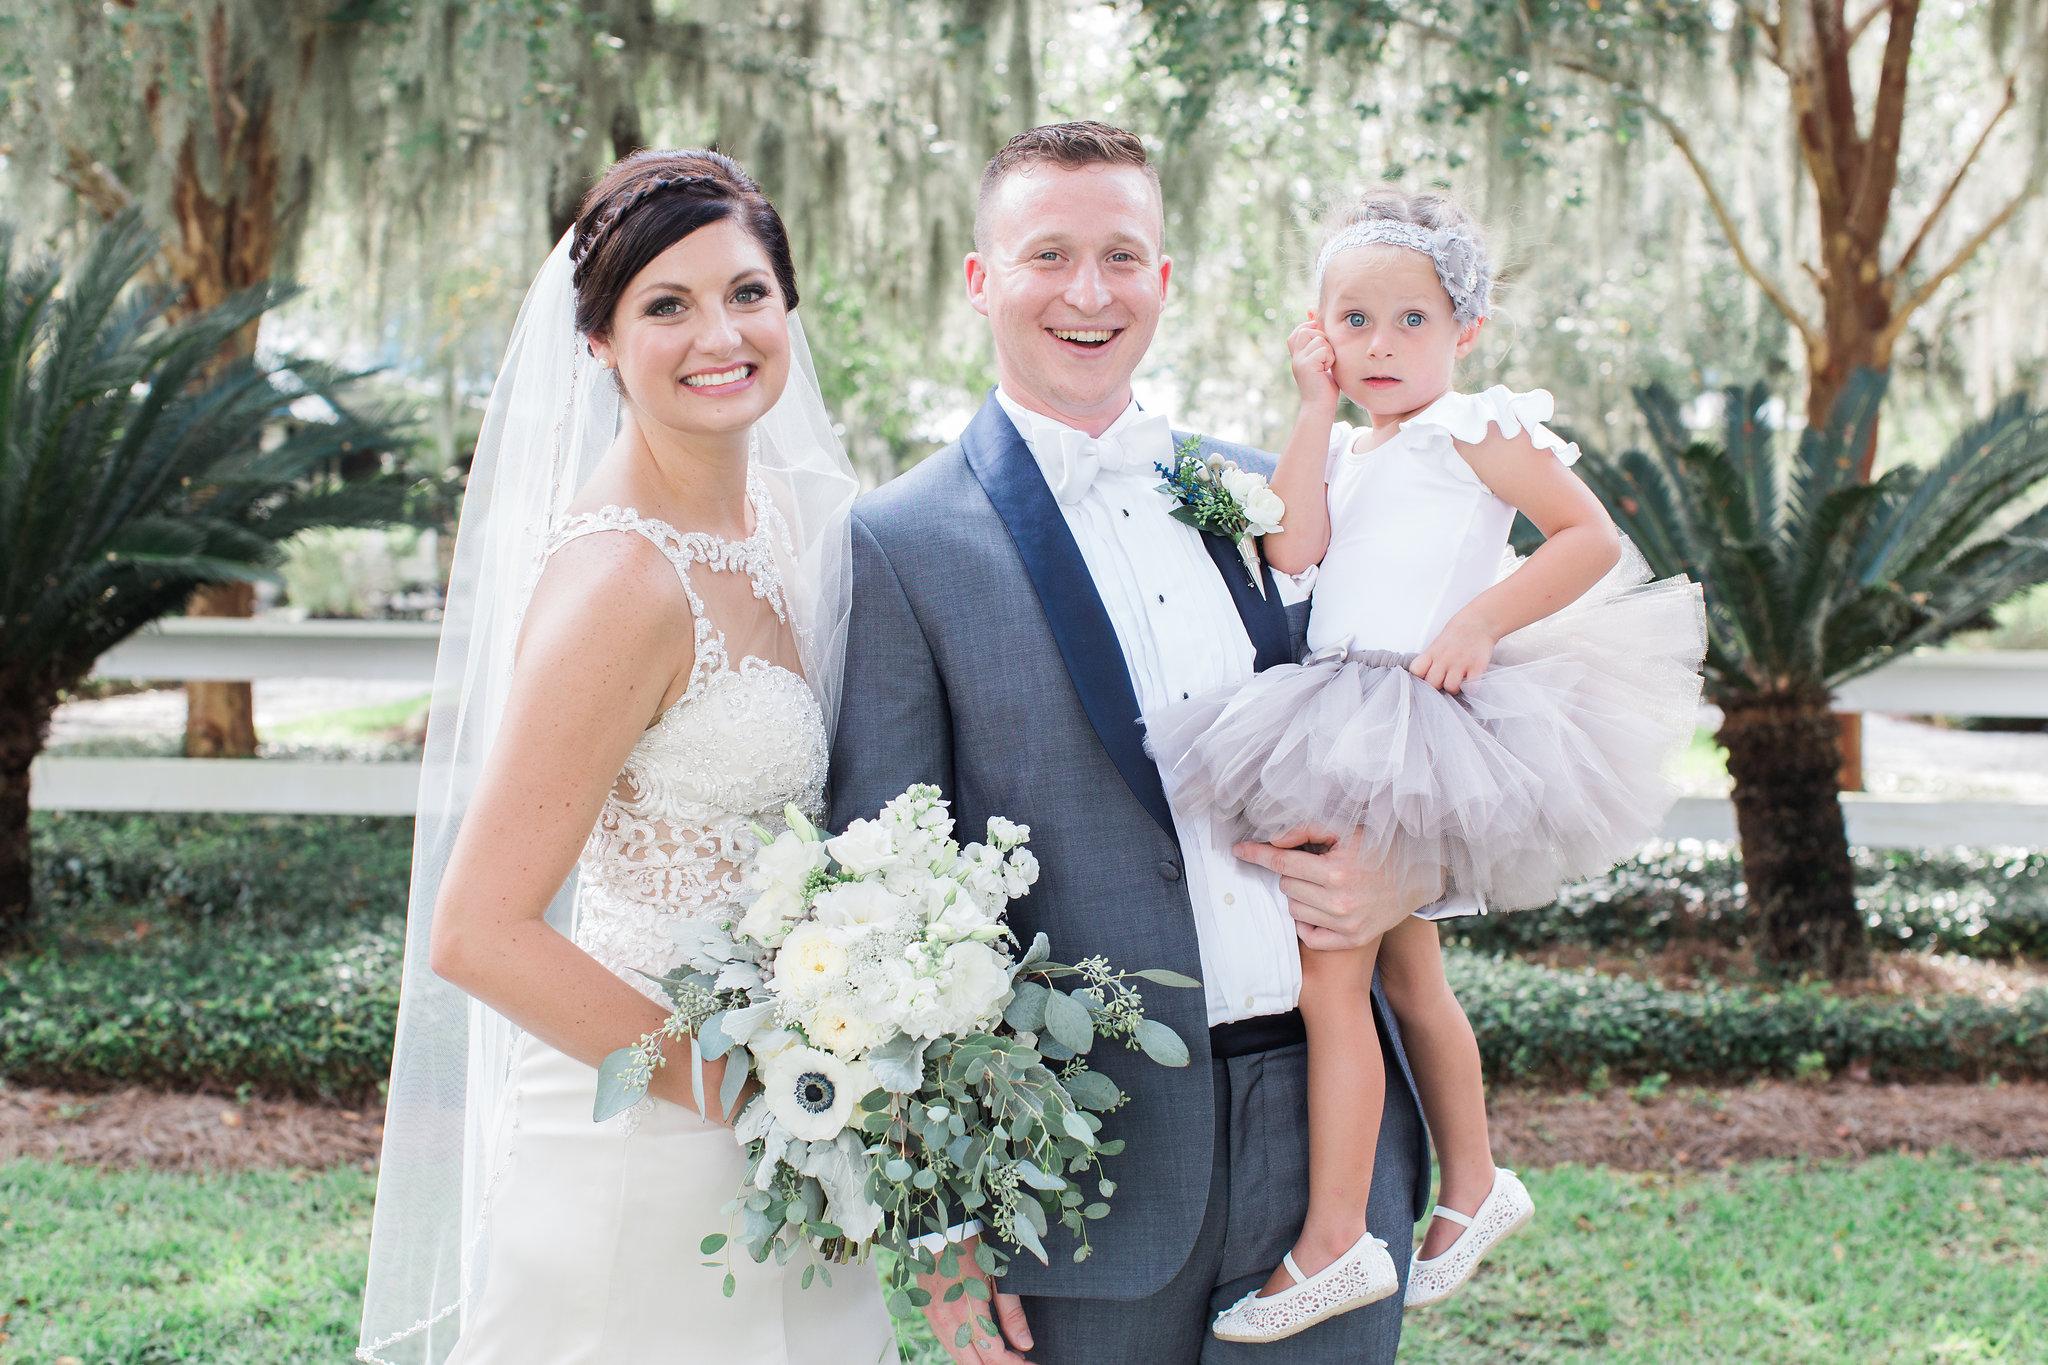 apt-b-photography-lauren-graham-oldfield-wedding-south-carolina-wedding-photographer-savannah-wedding-lowcountry-wedding-coastal-wedding-navy-bridesmaids-grey-flowergirl-dress-22.JPG